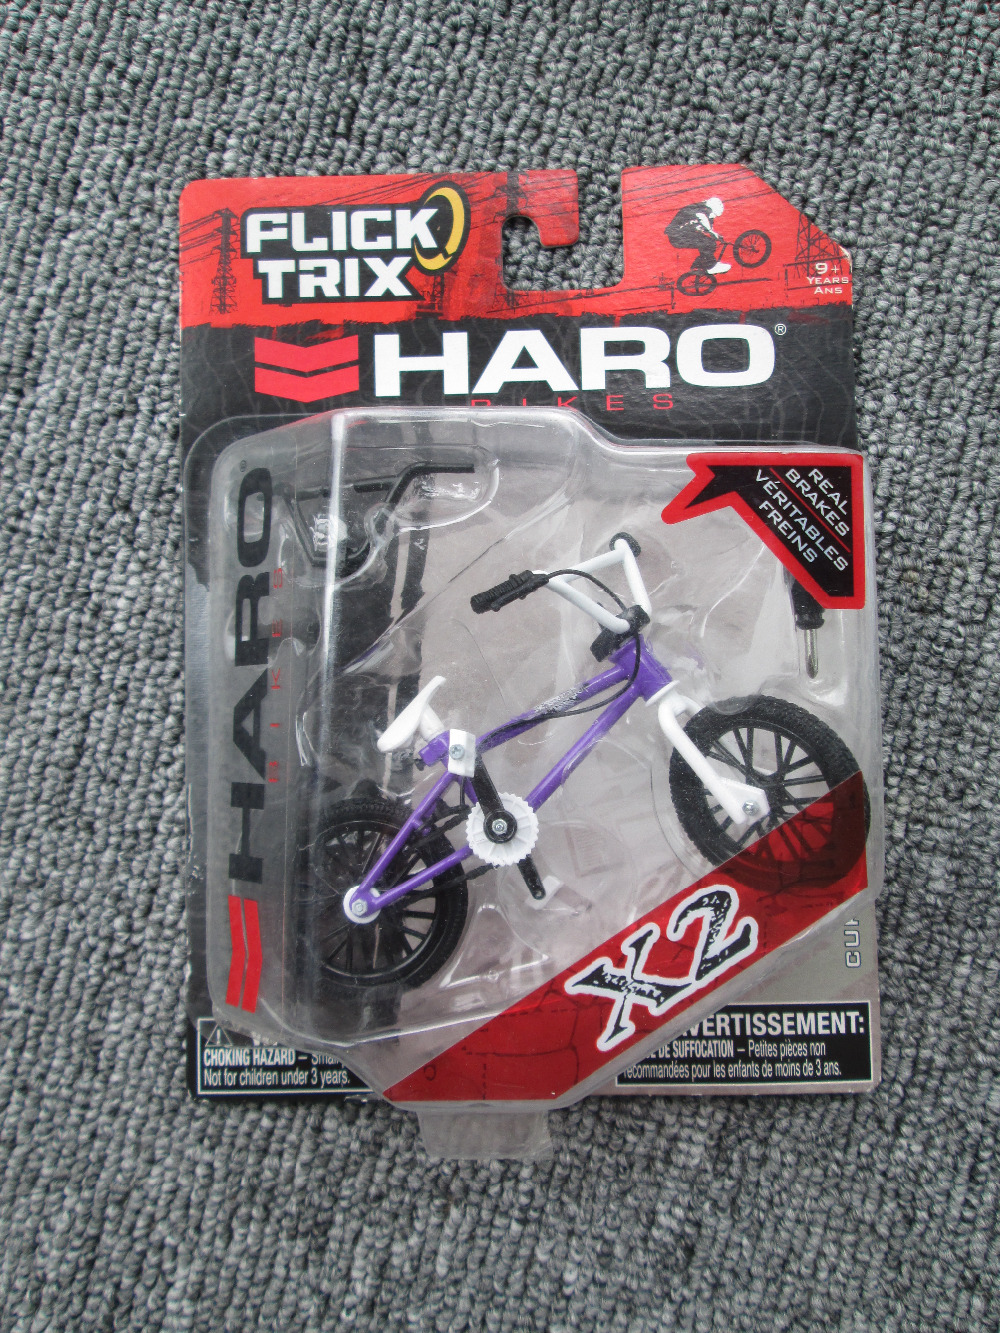 Hot! Purple&White Flick Trix Finger Bmx Bicicleta Real Brakes Professional Fun Gag Toys With Gadget